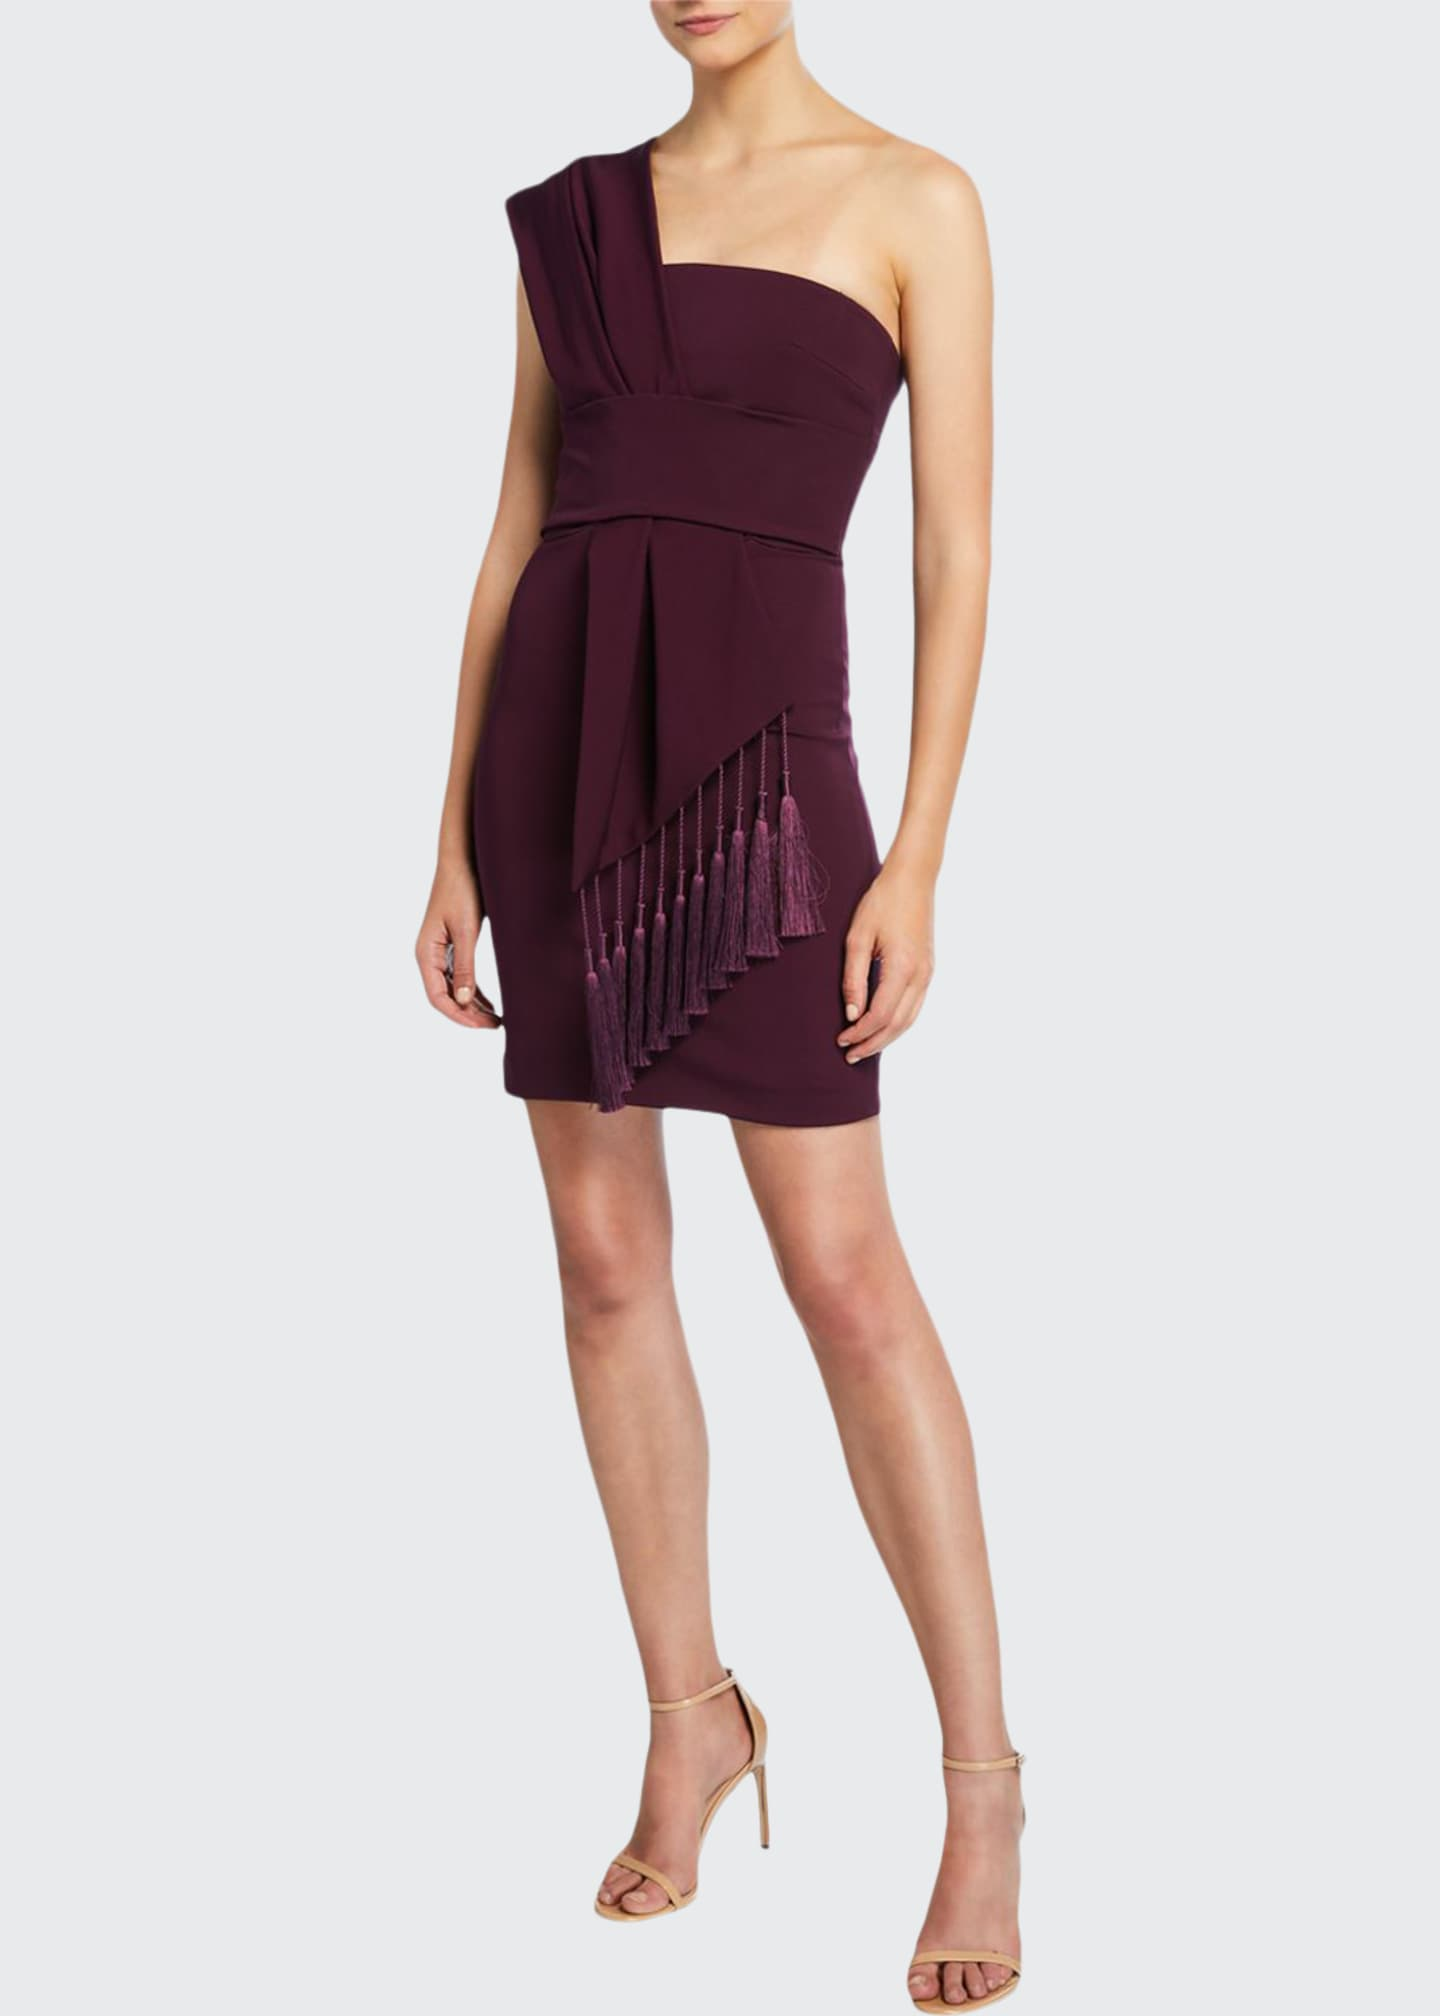 CUSHNIE One-Shoulder Scarf-Neck Mini Dress w/ Tassels